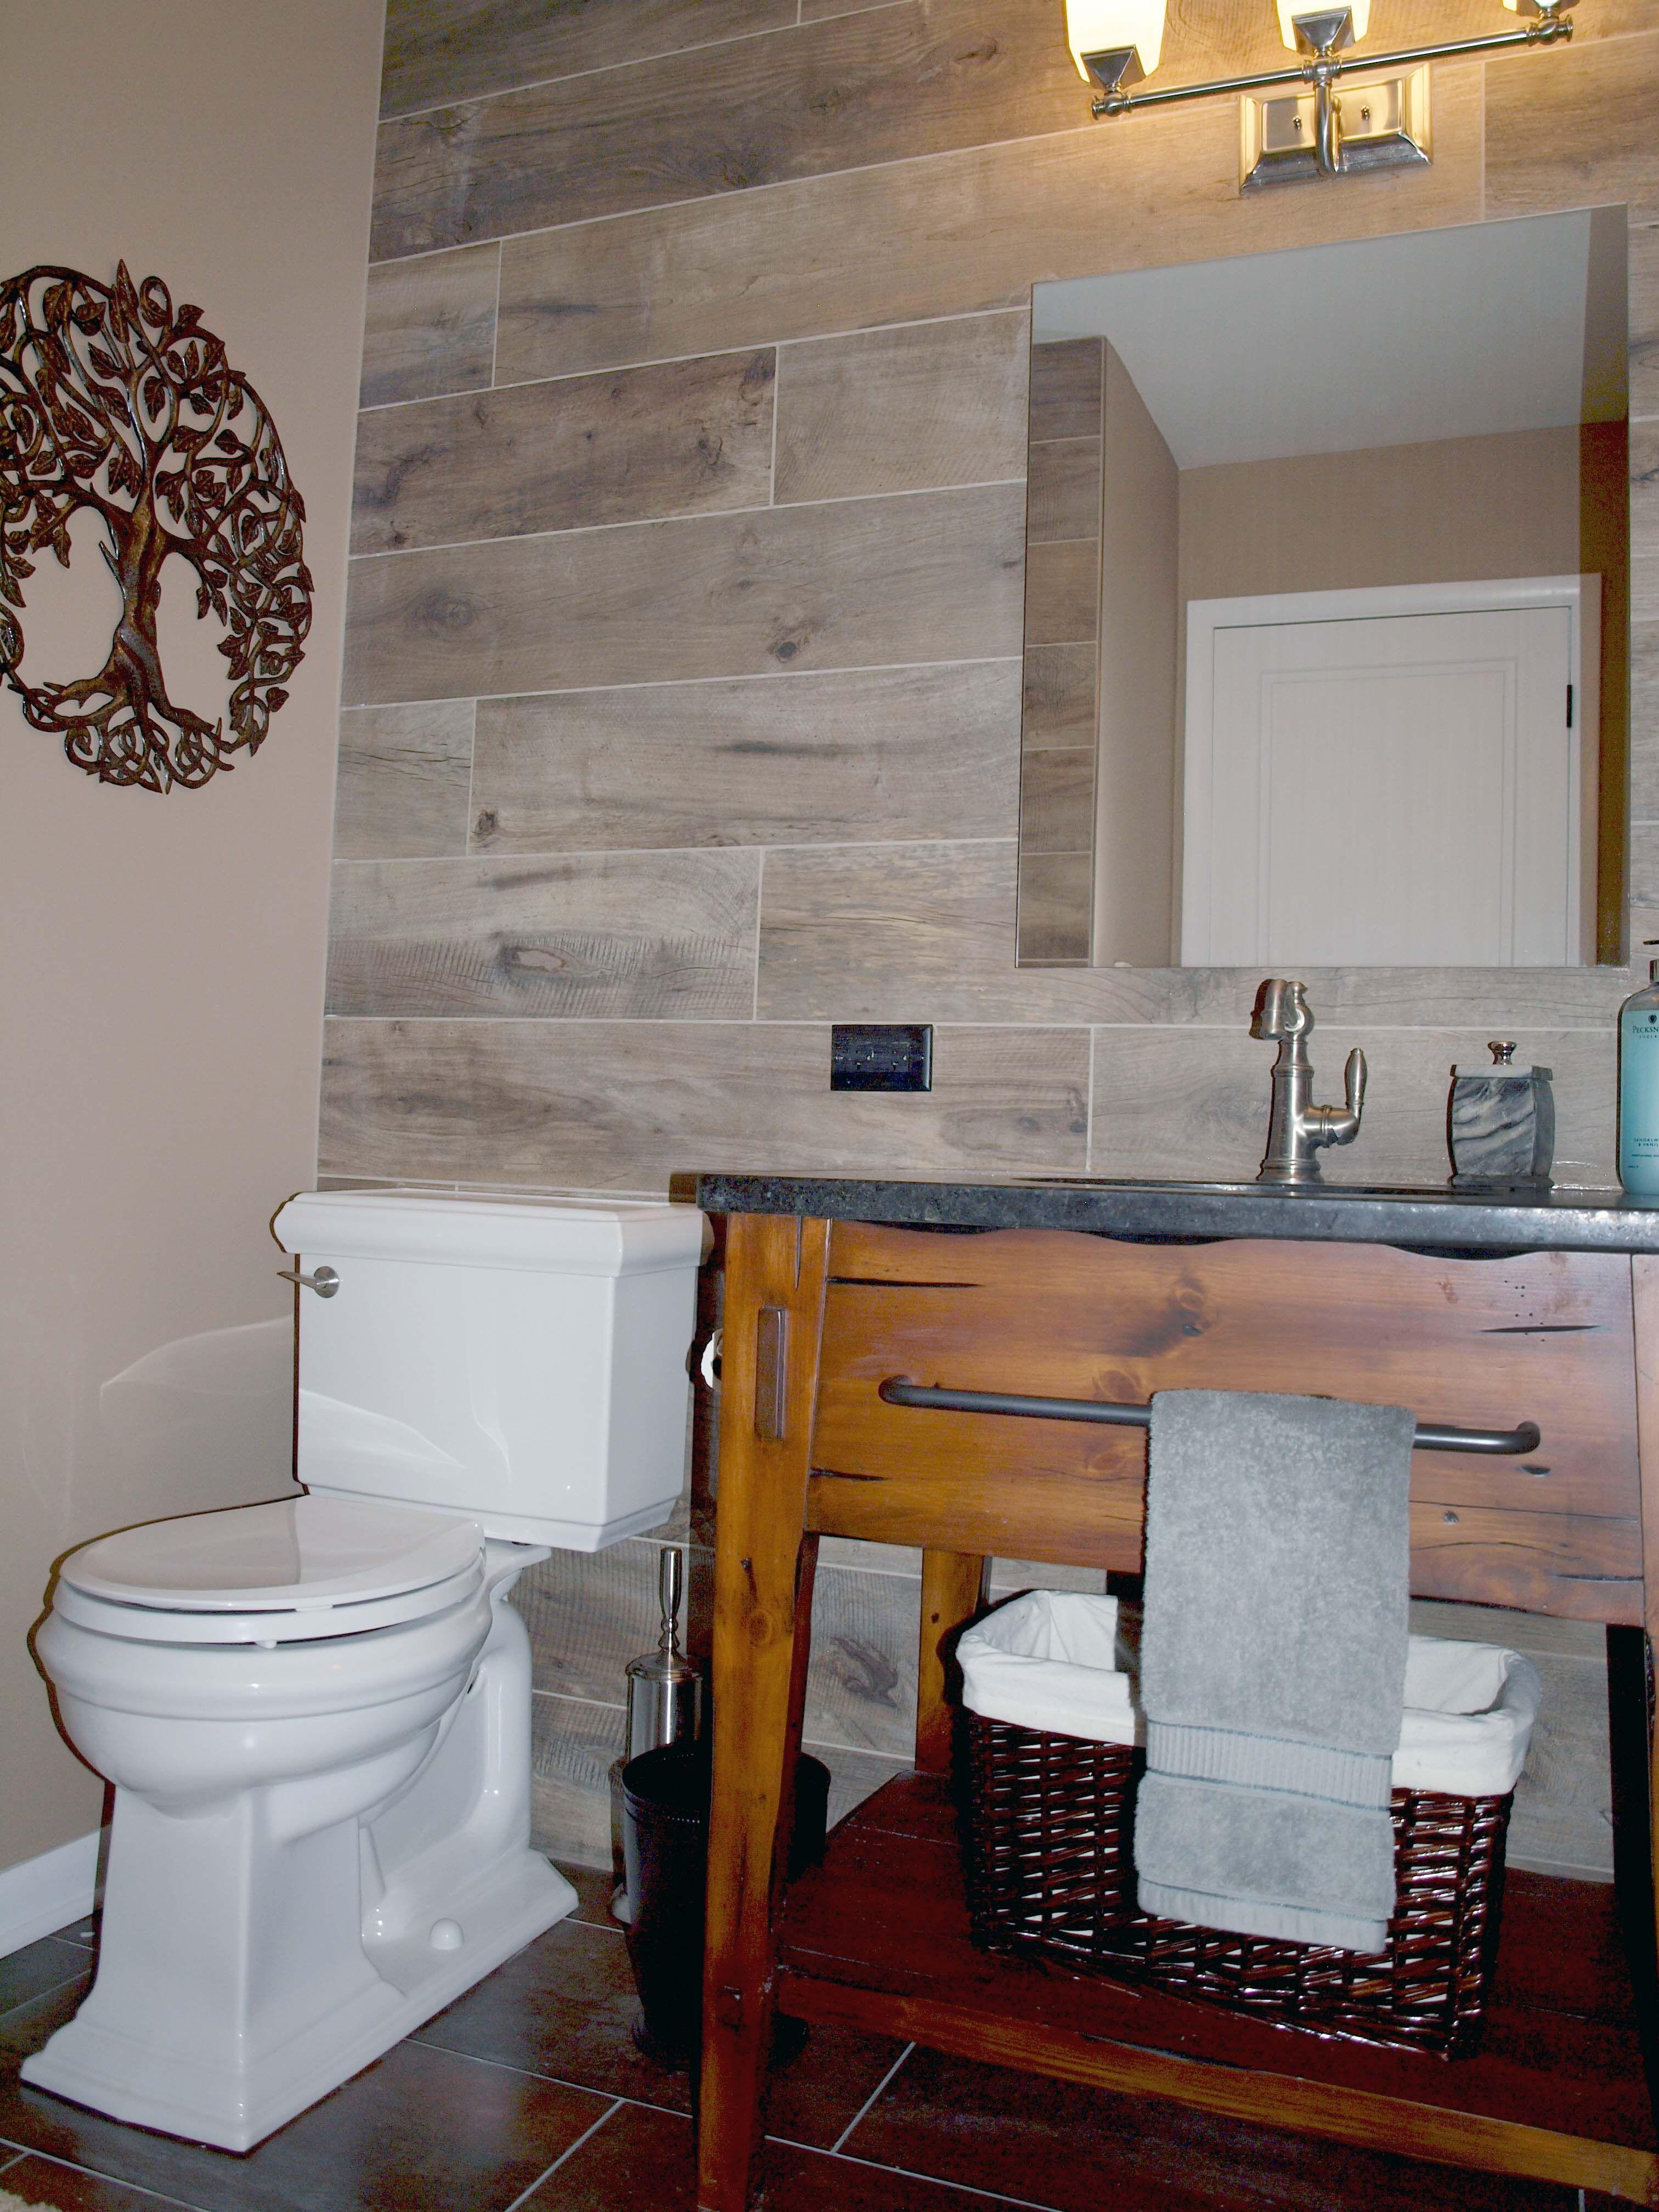 Porcelain Wood Tile Bathroom Accent Wall Wood Tile Bathroom Tile Accent Wall Bathroom Tile Accent Wall